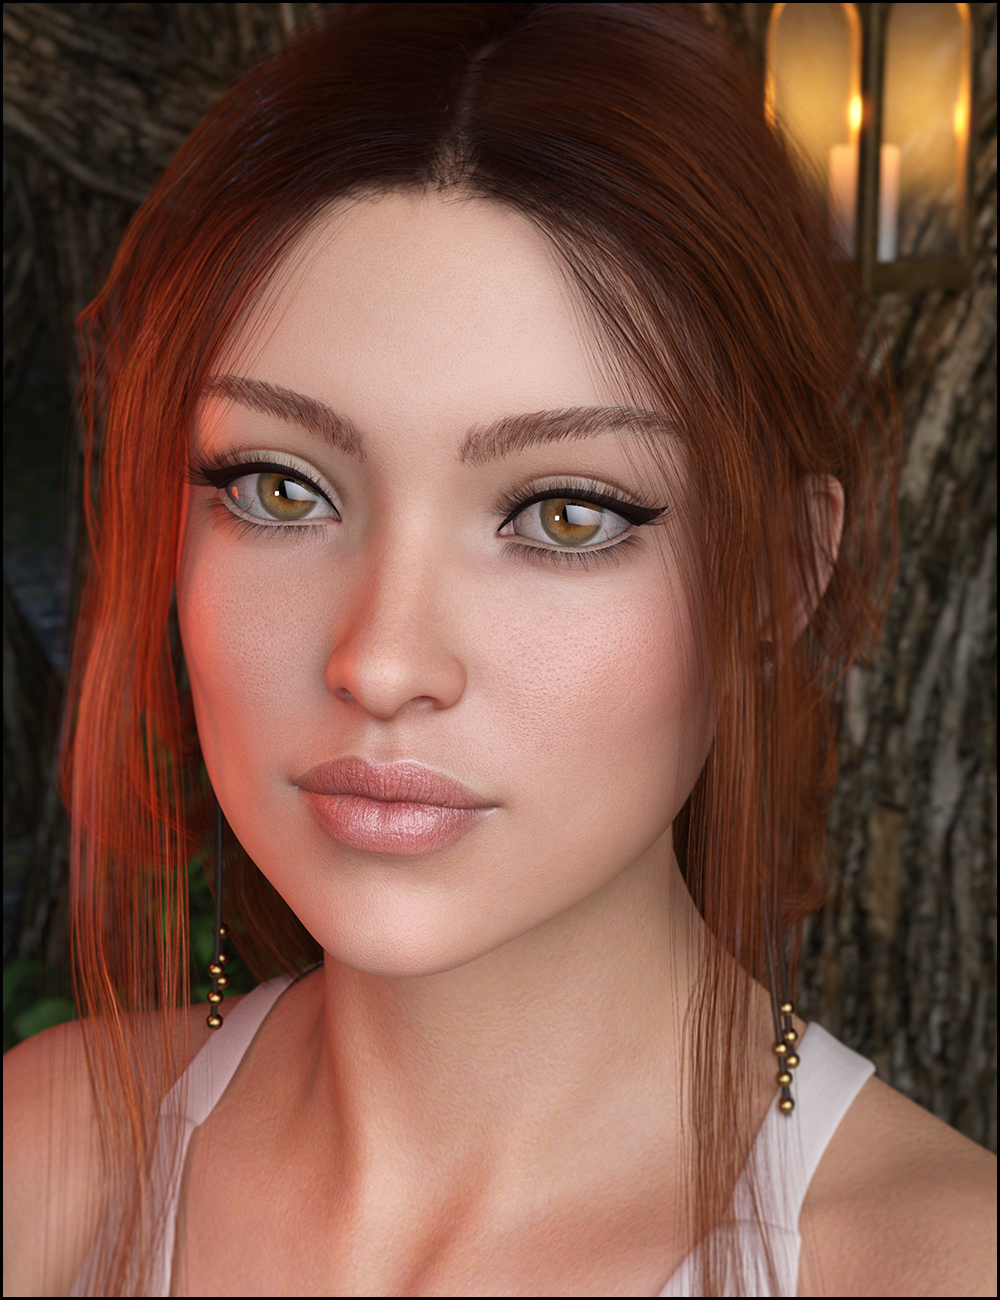 Lanya for CJ 8 by: Jessaii, 3D Models by Daz 3D